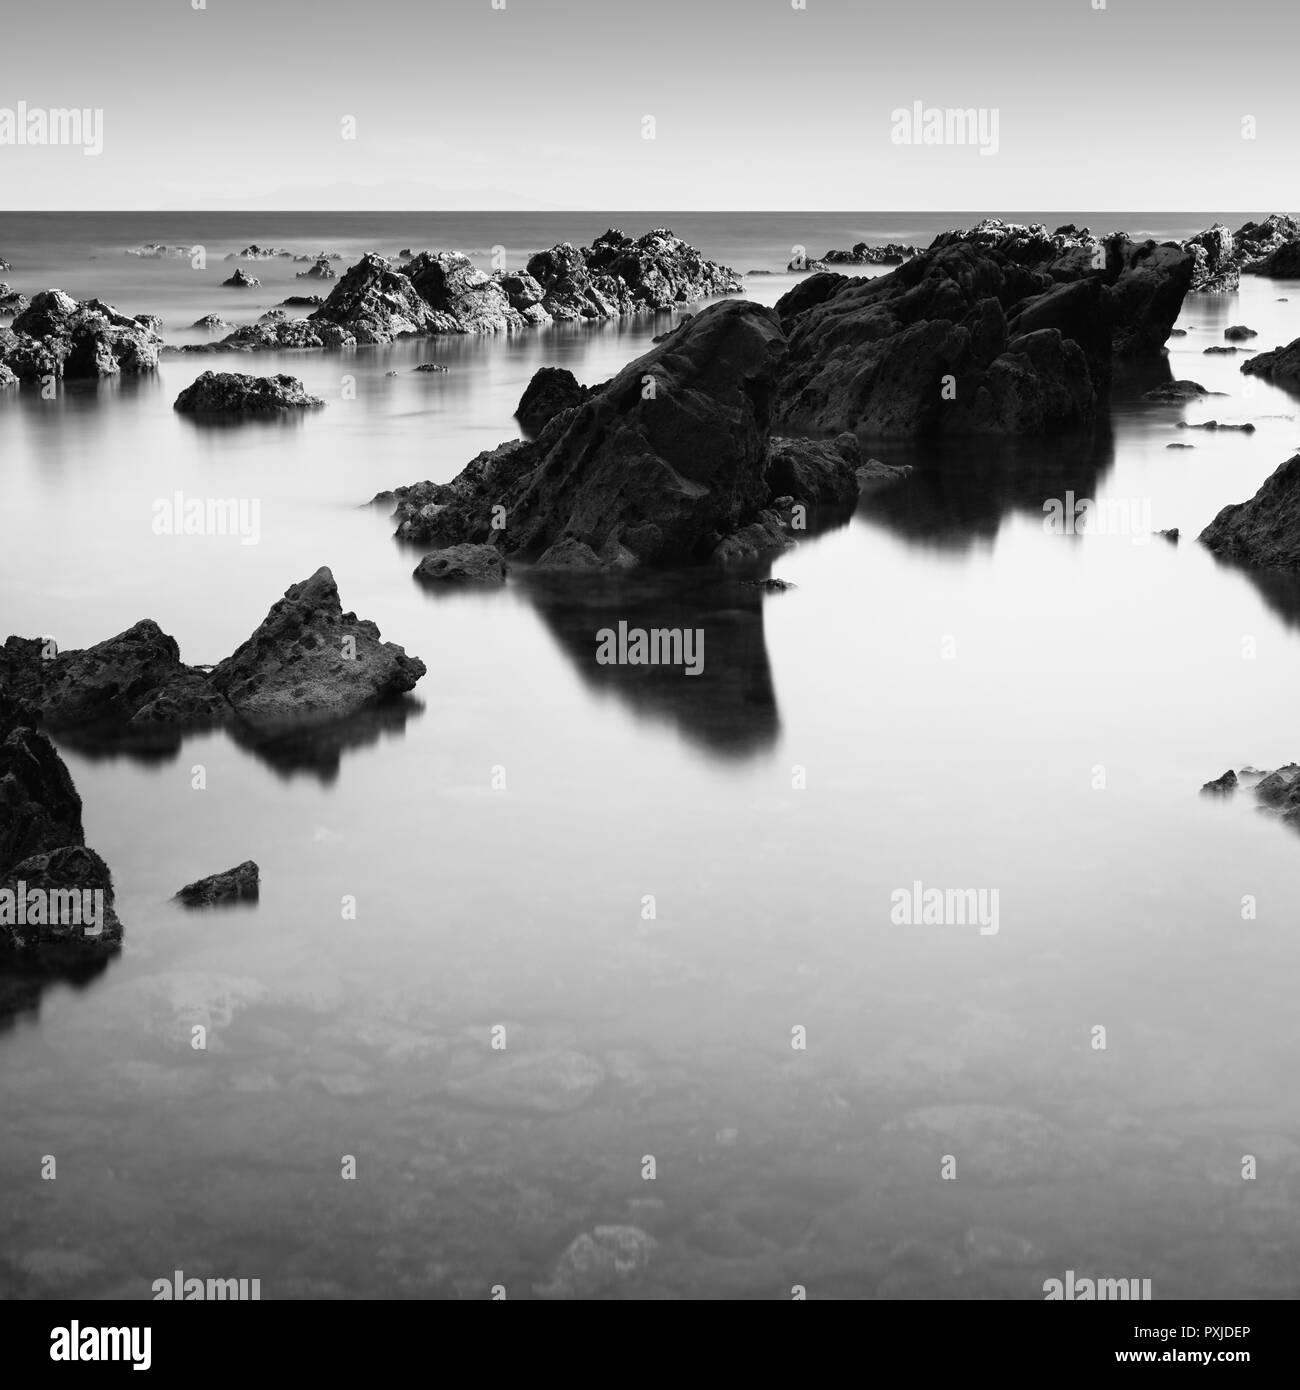 Sea rocks and silky water at Arasaki coast, Miura Peninsula, Japan - Stock Image